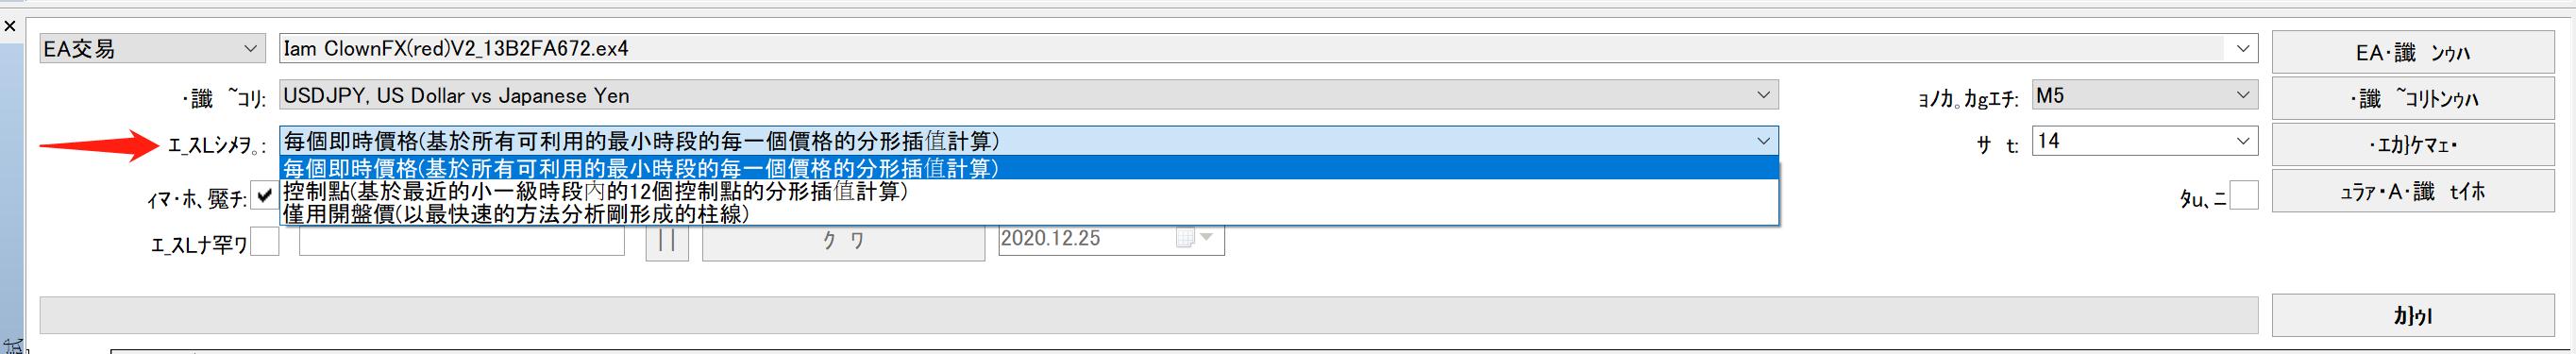 EA教學-EA測試界面選擇復盤模式